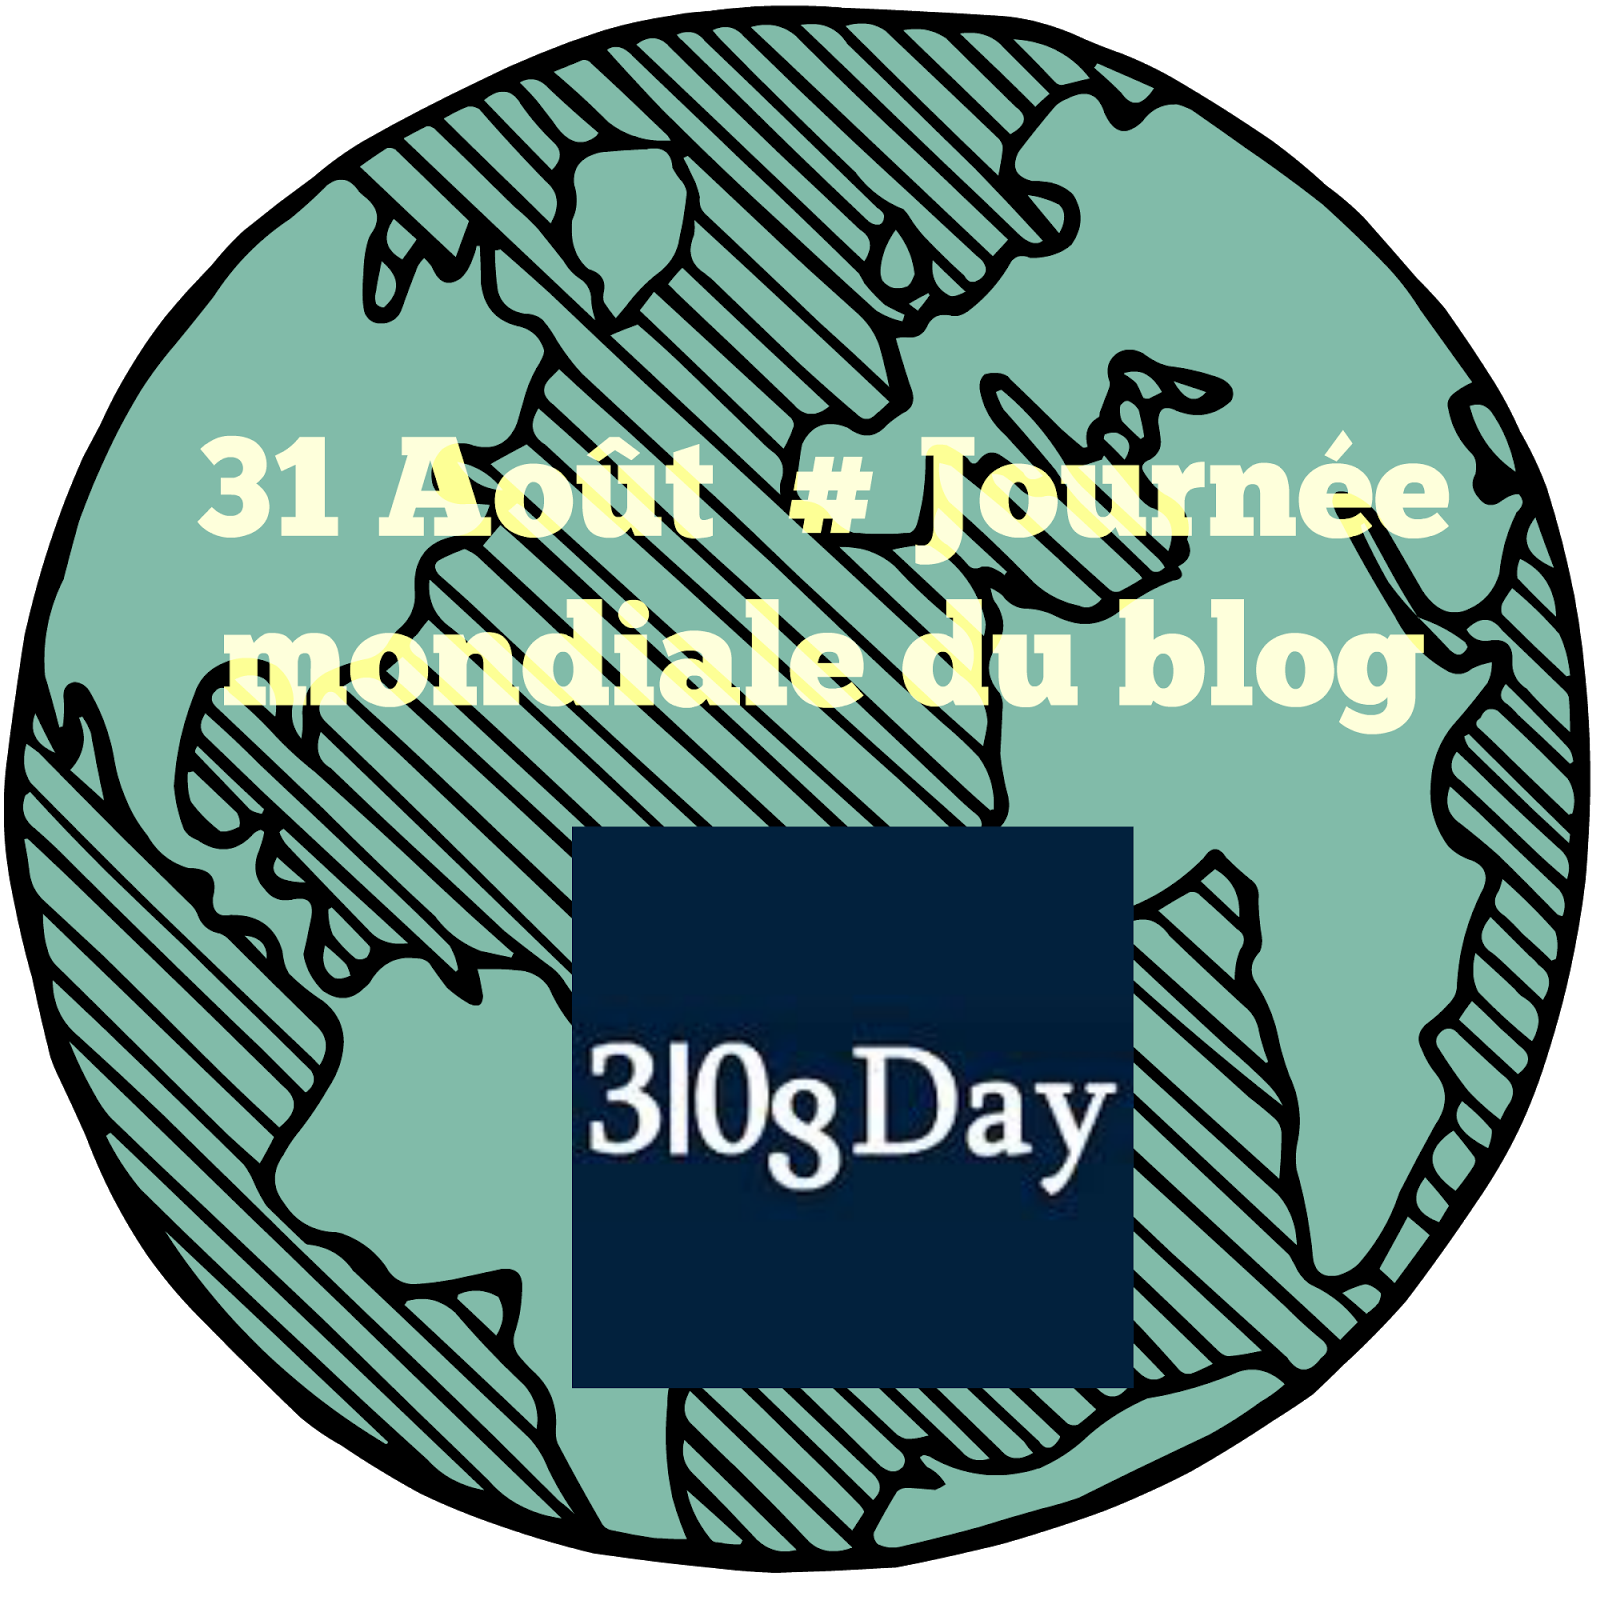 blog-alessaknox-journee-mondiale